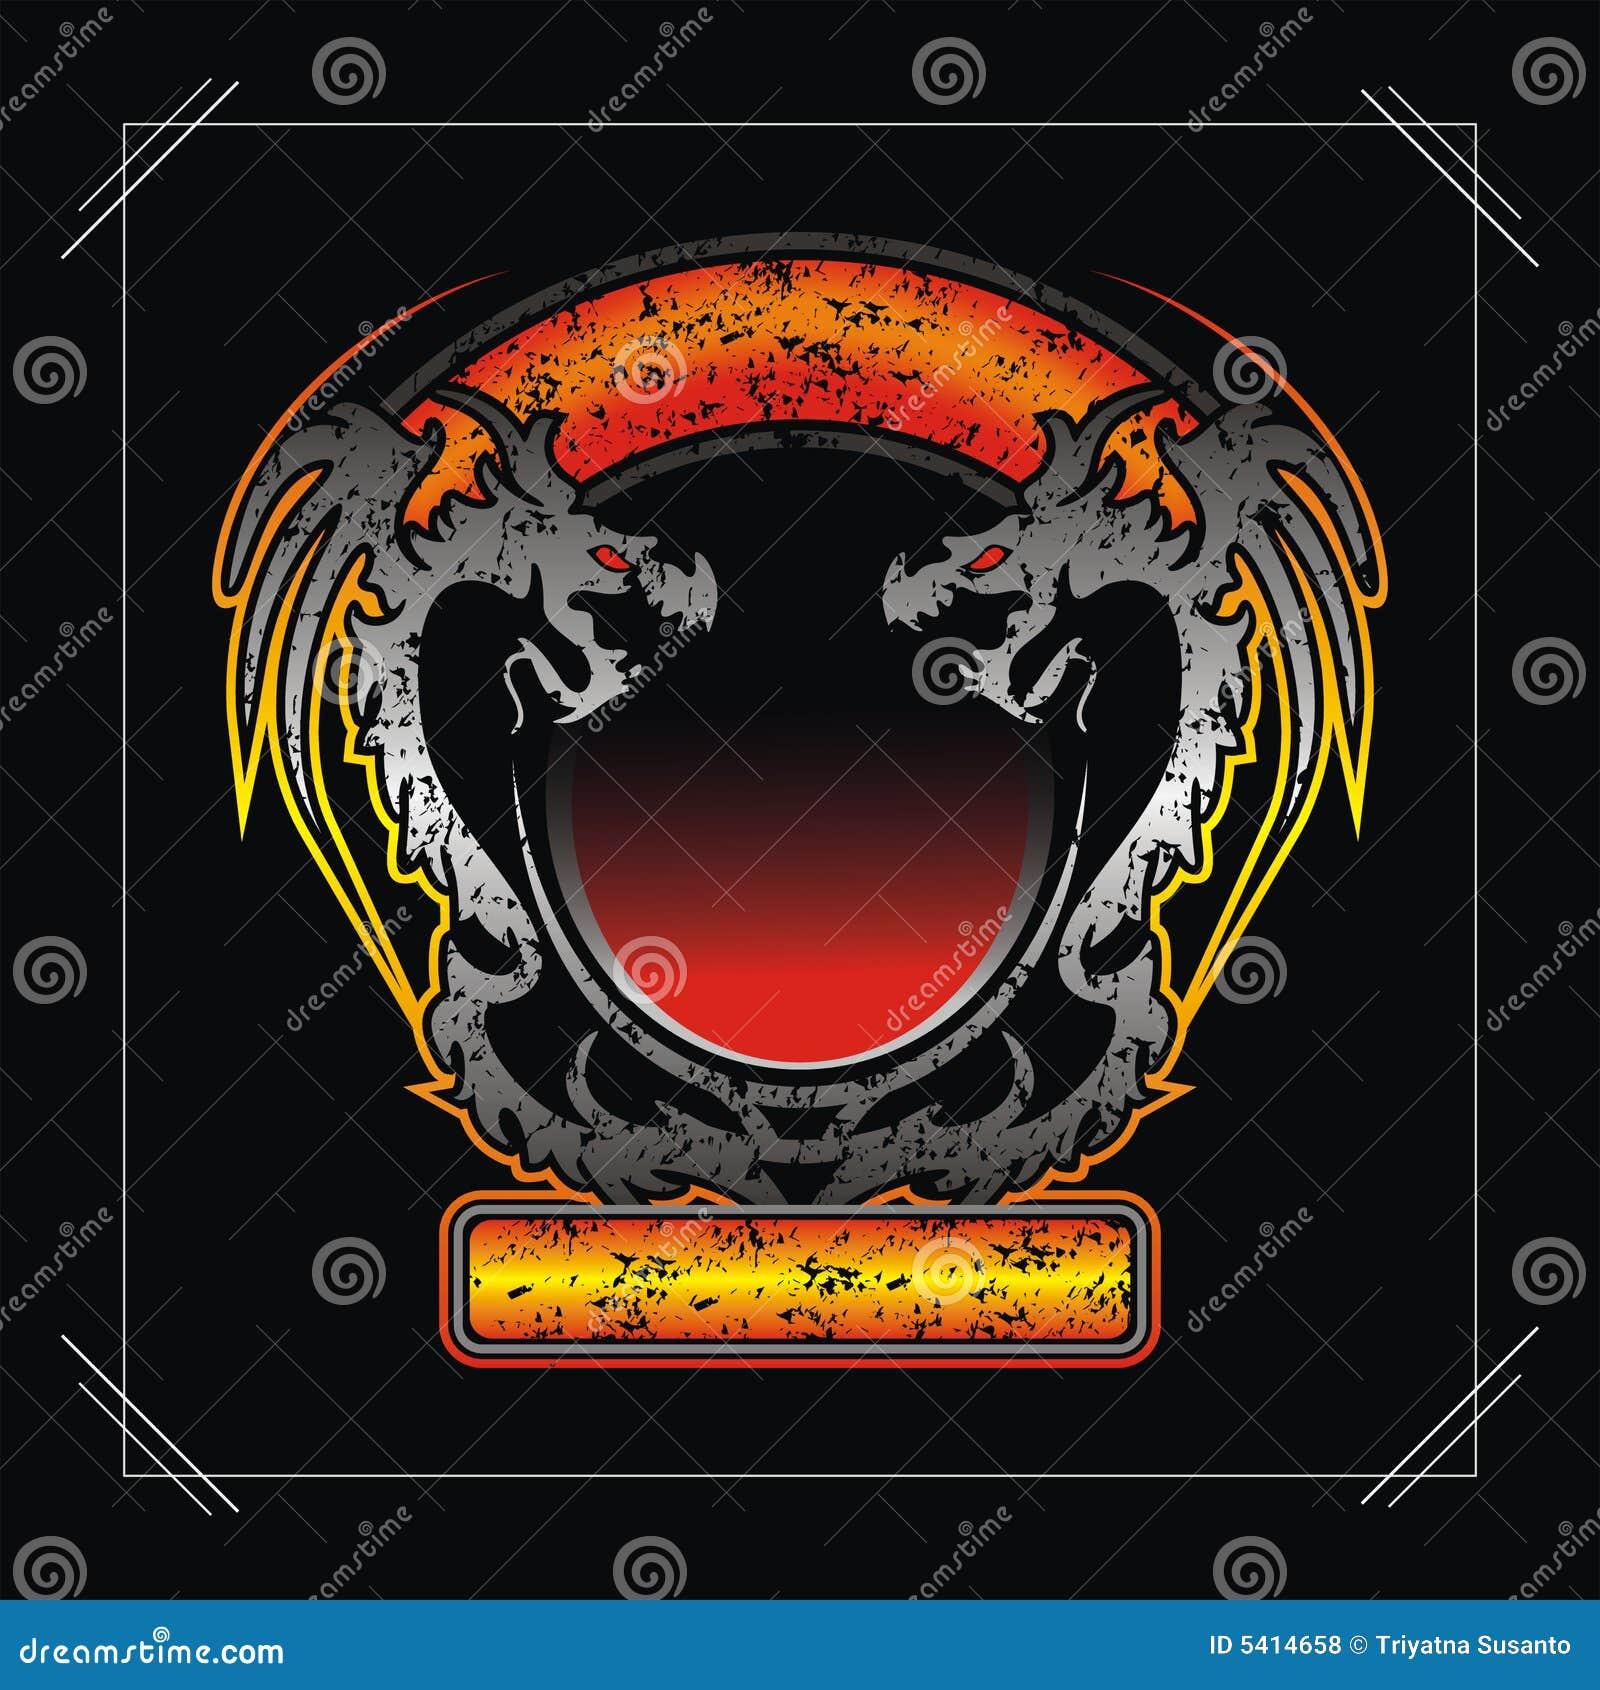 Dragon frame stock vector. Illustration of material, element - 5414658